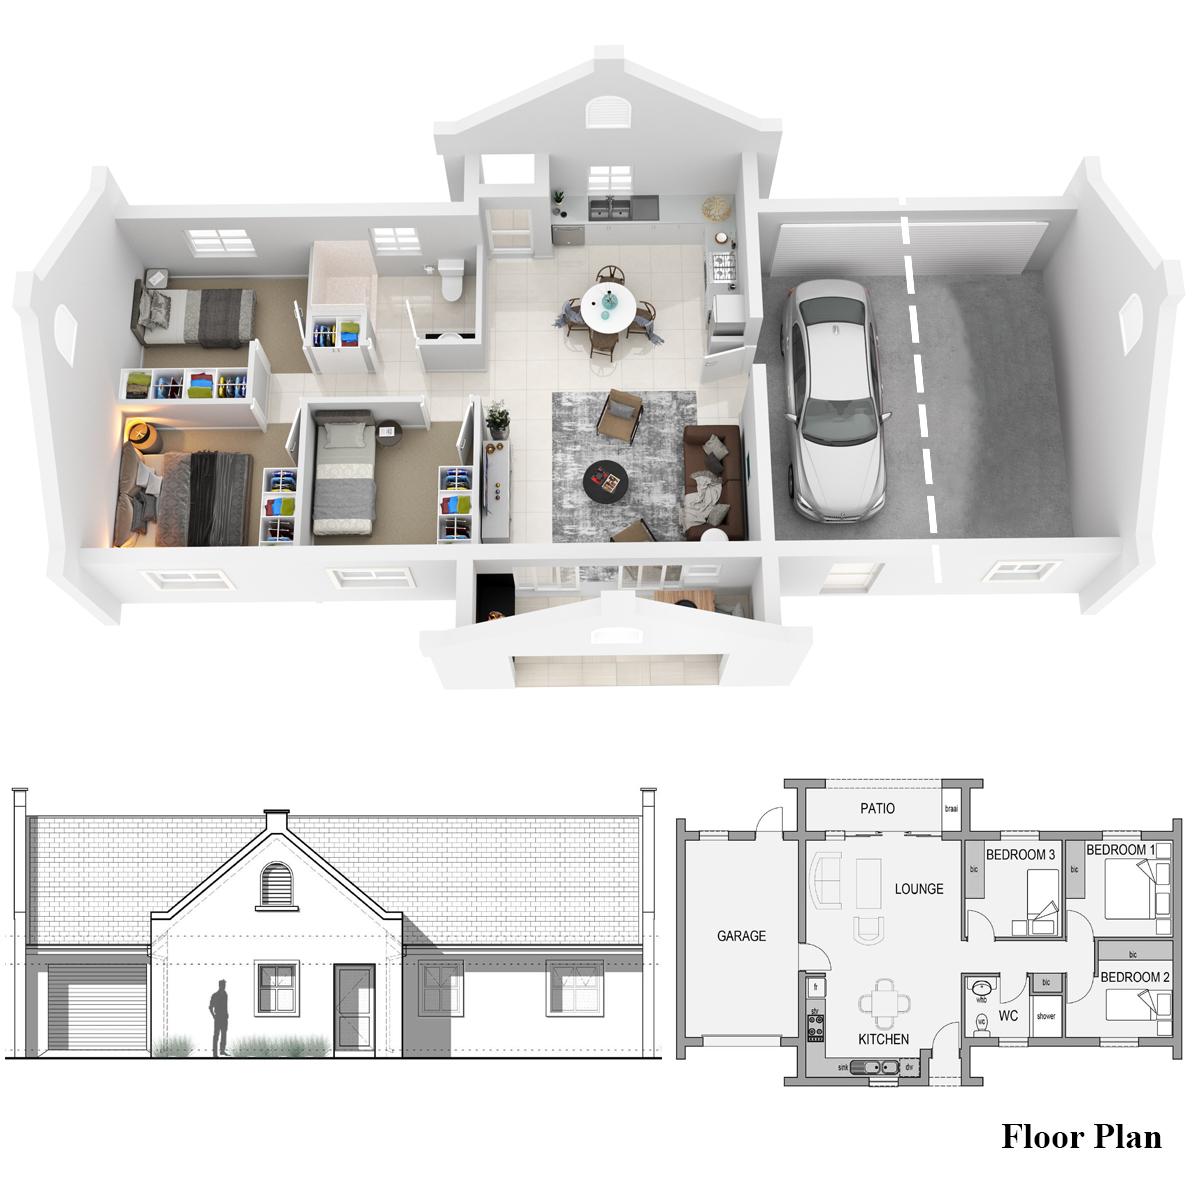 zevenwacht-lifestyle-estate-retirement-home-type-h1-1200x1191